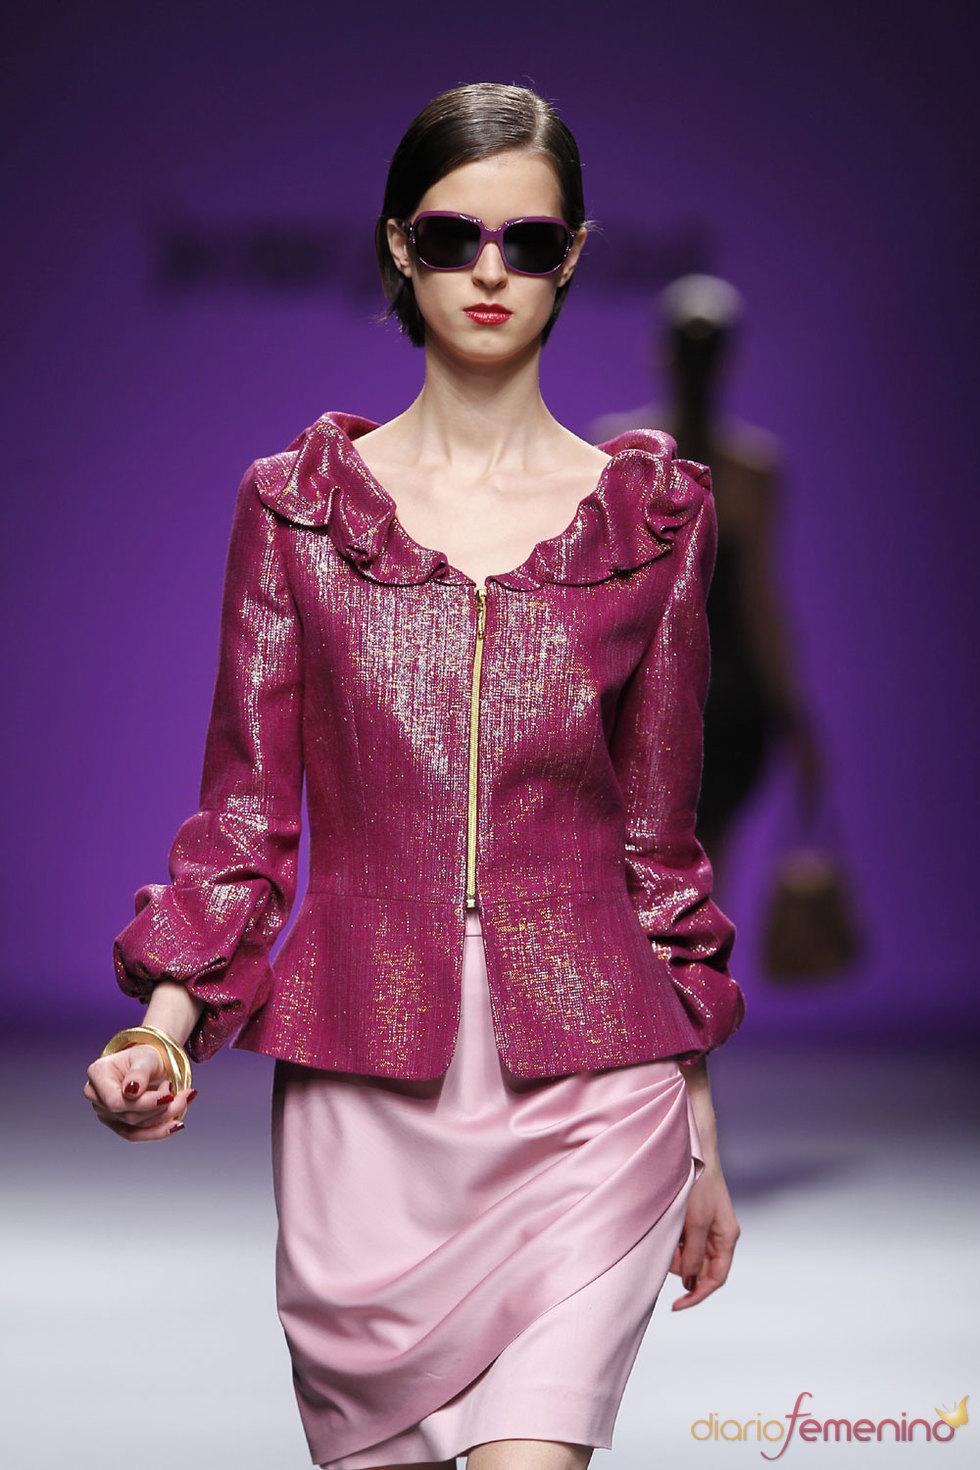 Moda Mujer Otoño Invierno 2010 - 2011 Javier Larrainzar